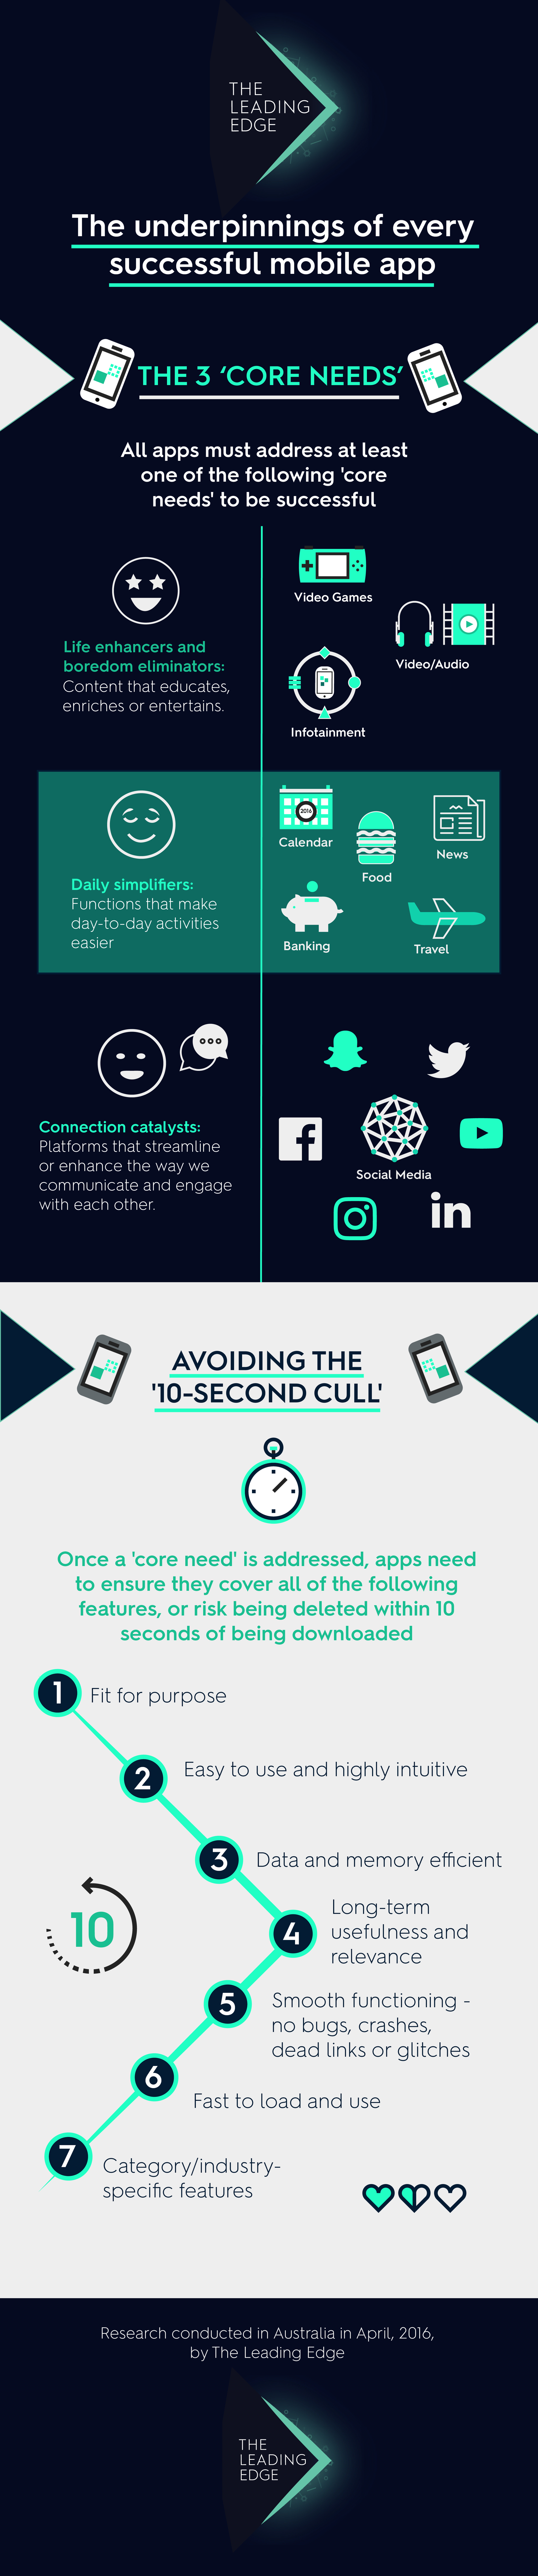 The Leading Edge Infographic-01.jpg